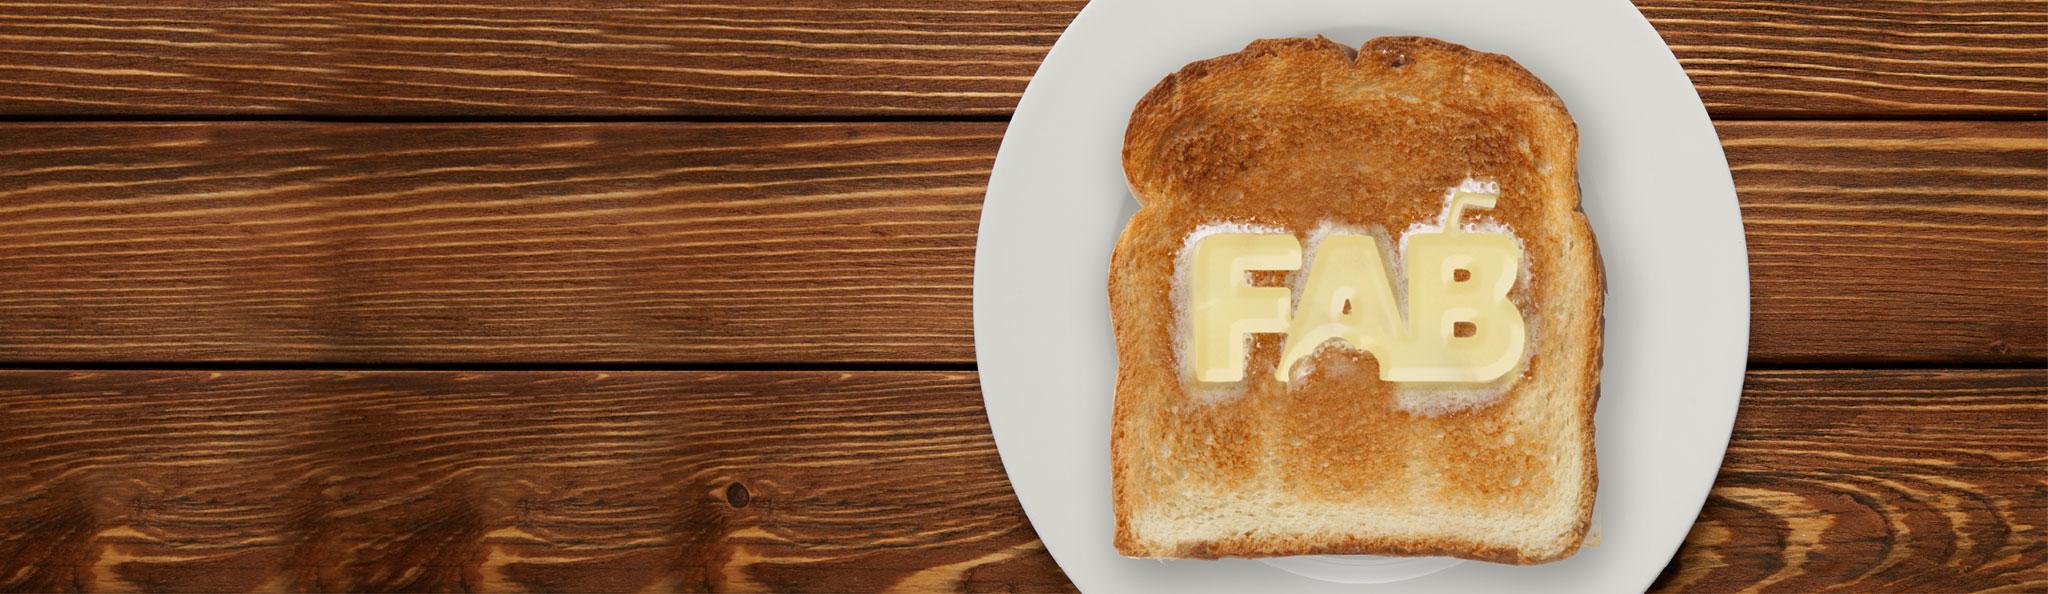 FAB Awards Toast